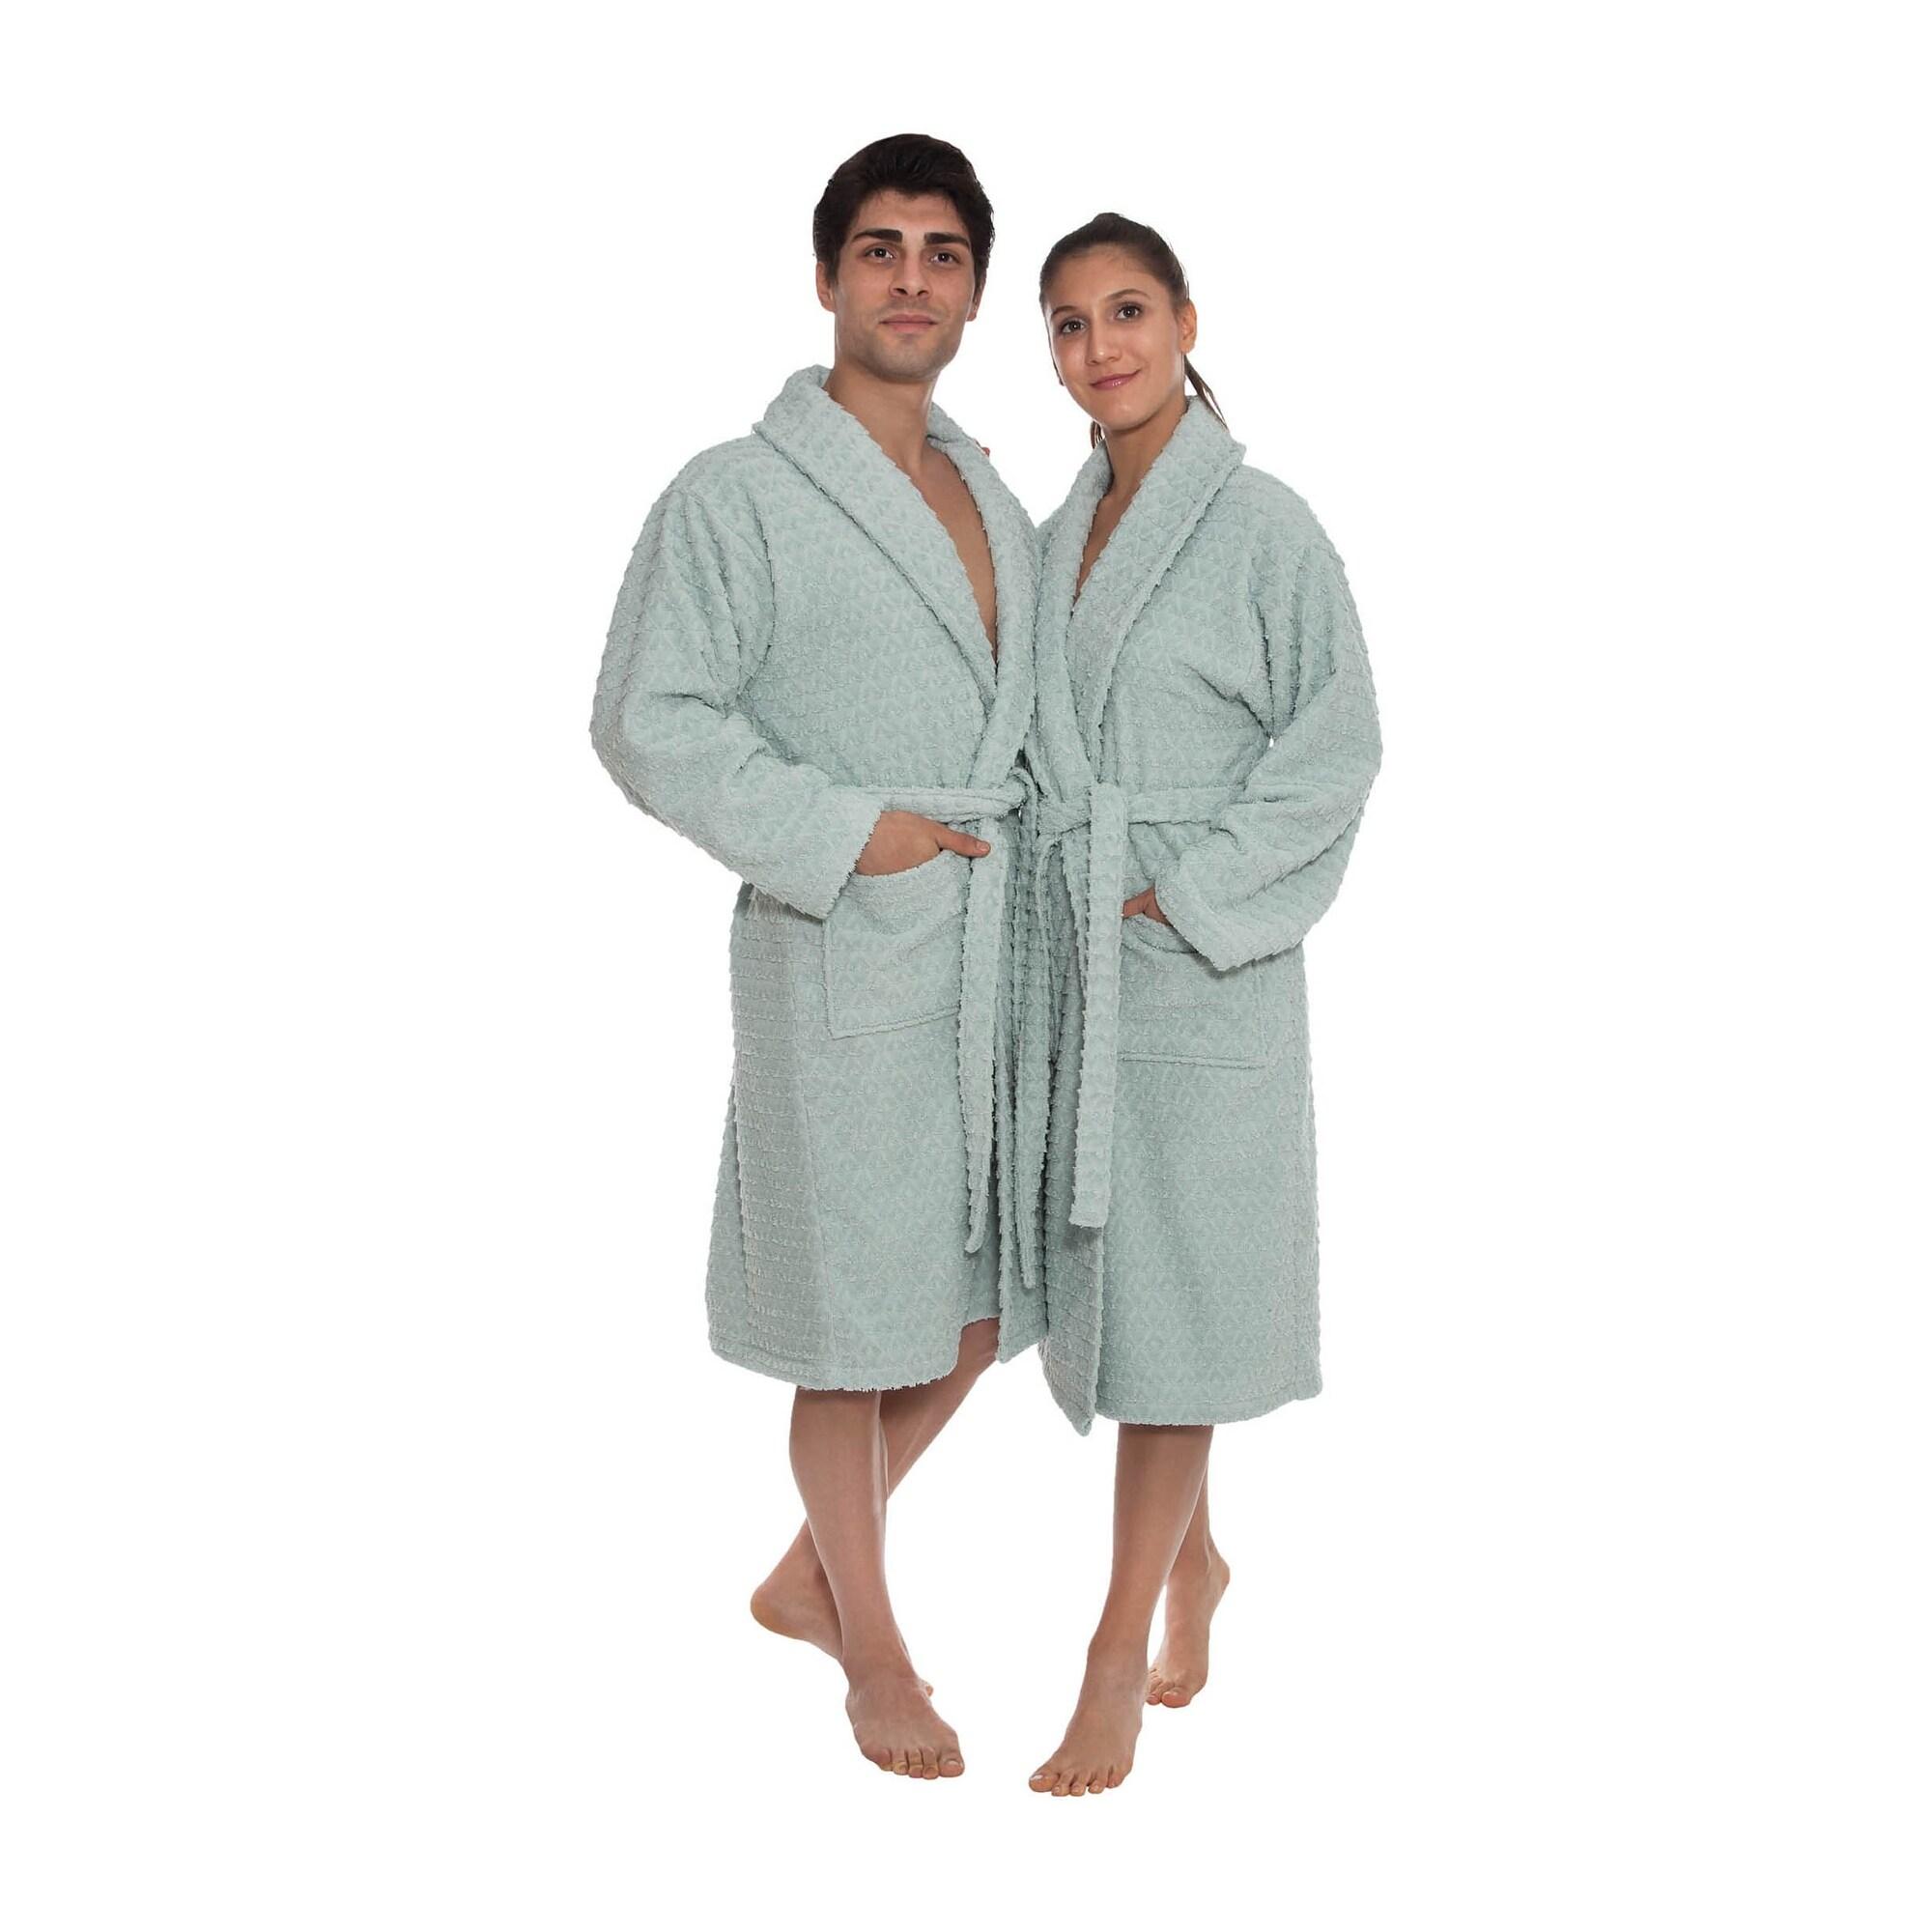 Ozan Premium Home Azure Bathrobes Collection 100 Turkish Cotton Unisex Terry Cloth Bathrobe On Sale Overstock 32428634